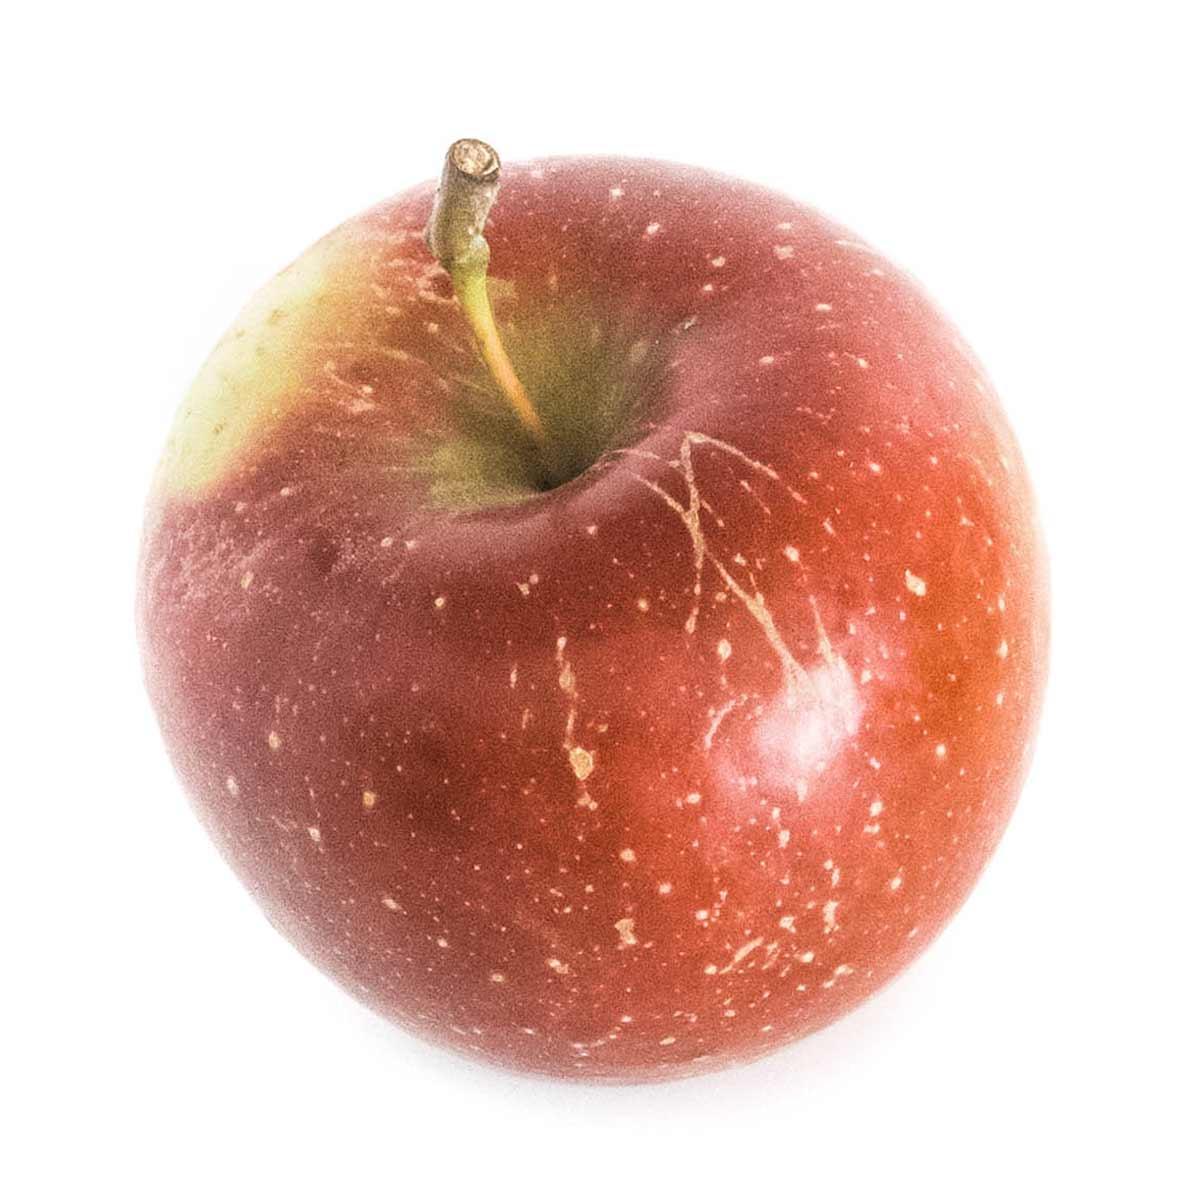 Rome beauty apple variety